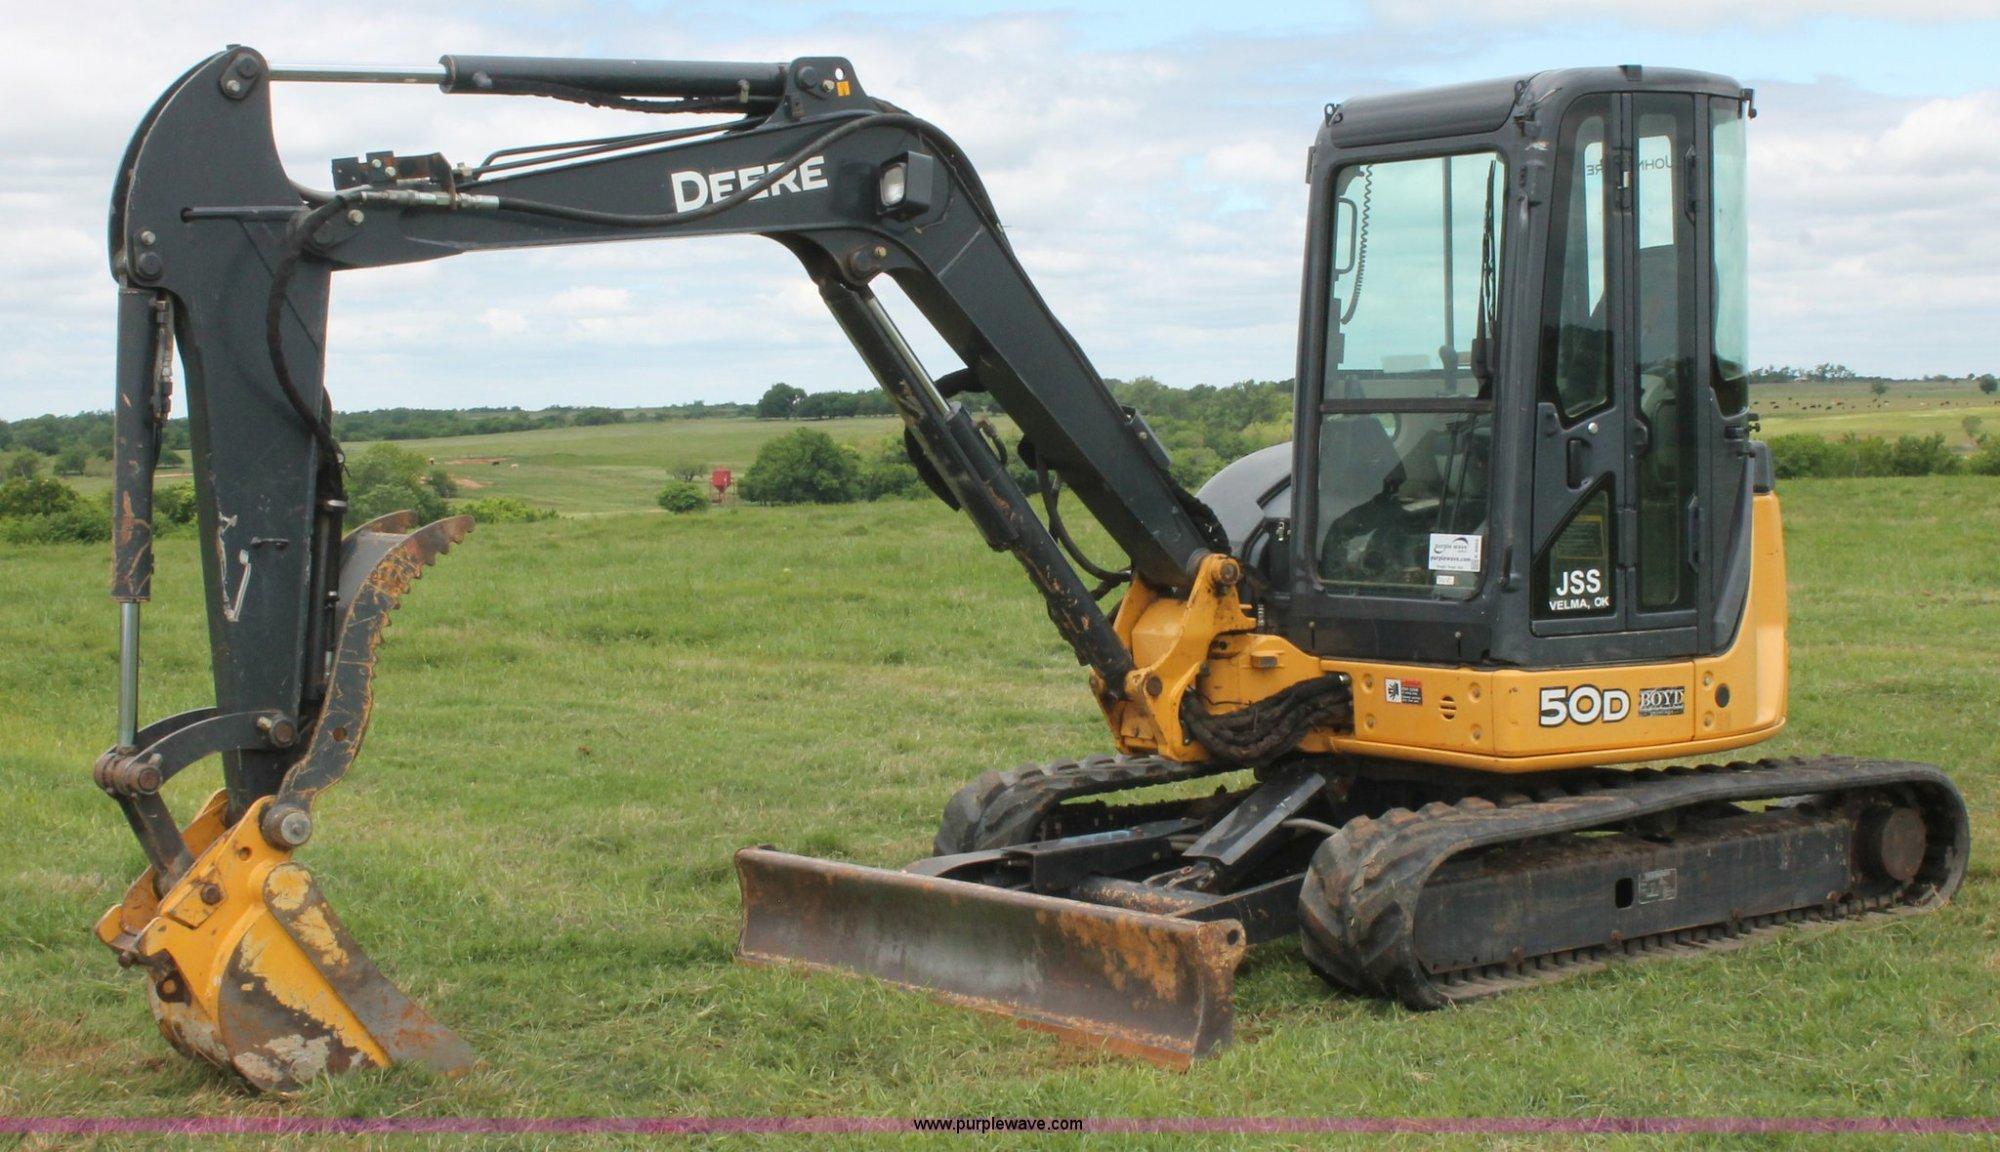 hight resolution of 2011 john deere 50d mini excavator item k8903 sold may rh purplewave com john deere 5058e john deere 5075e